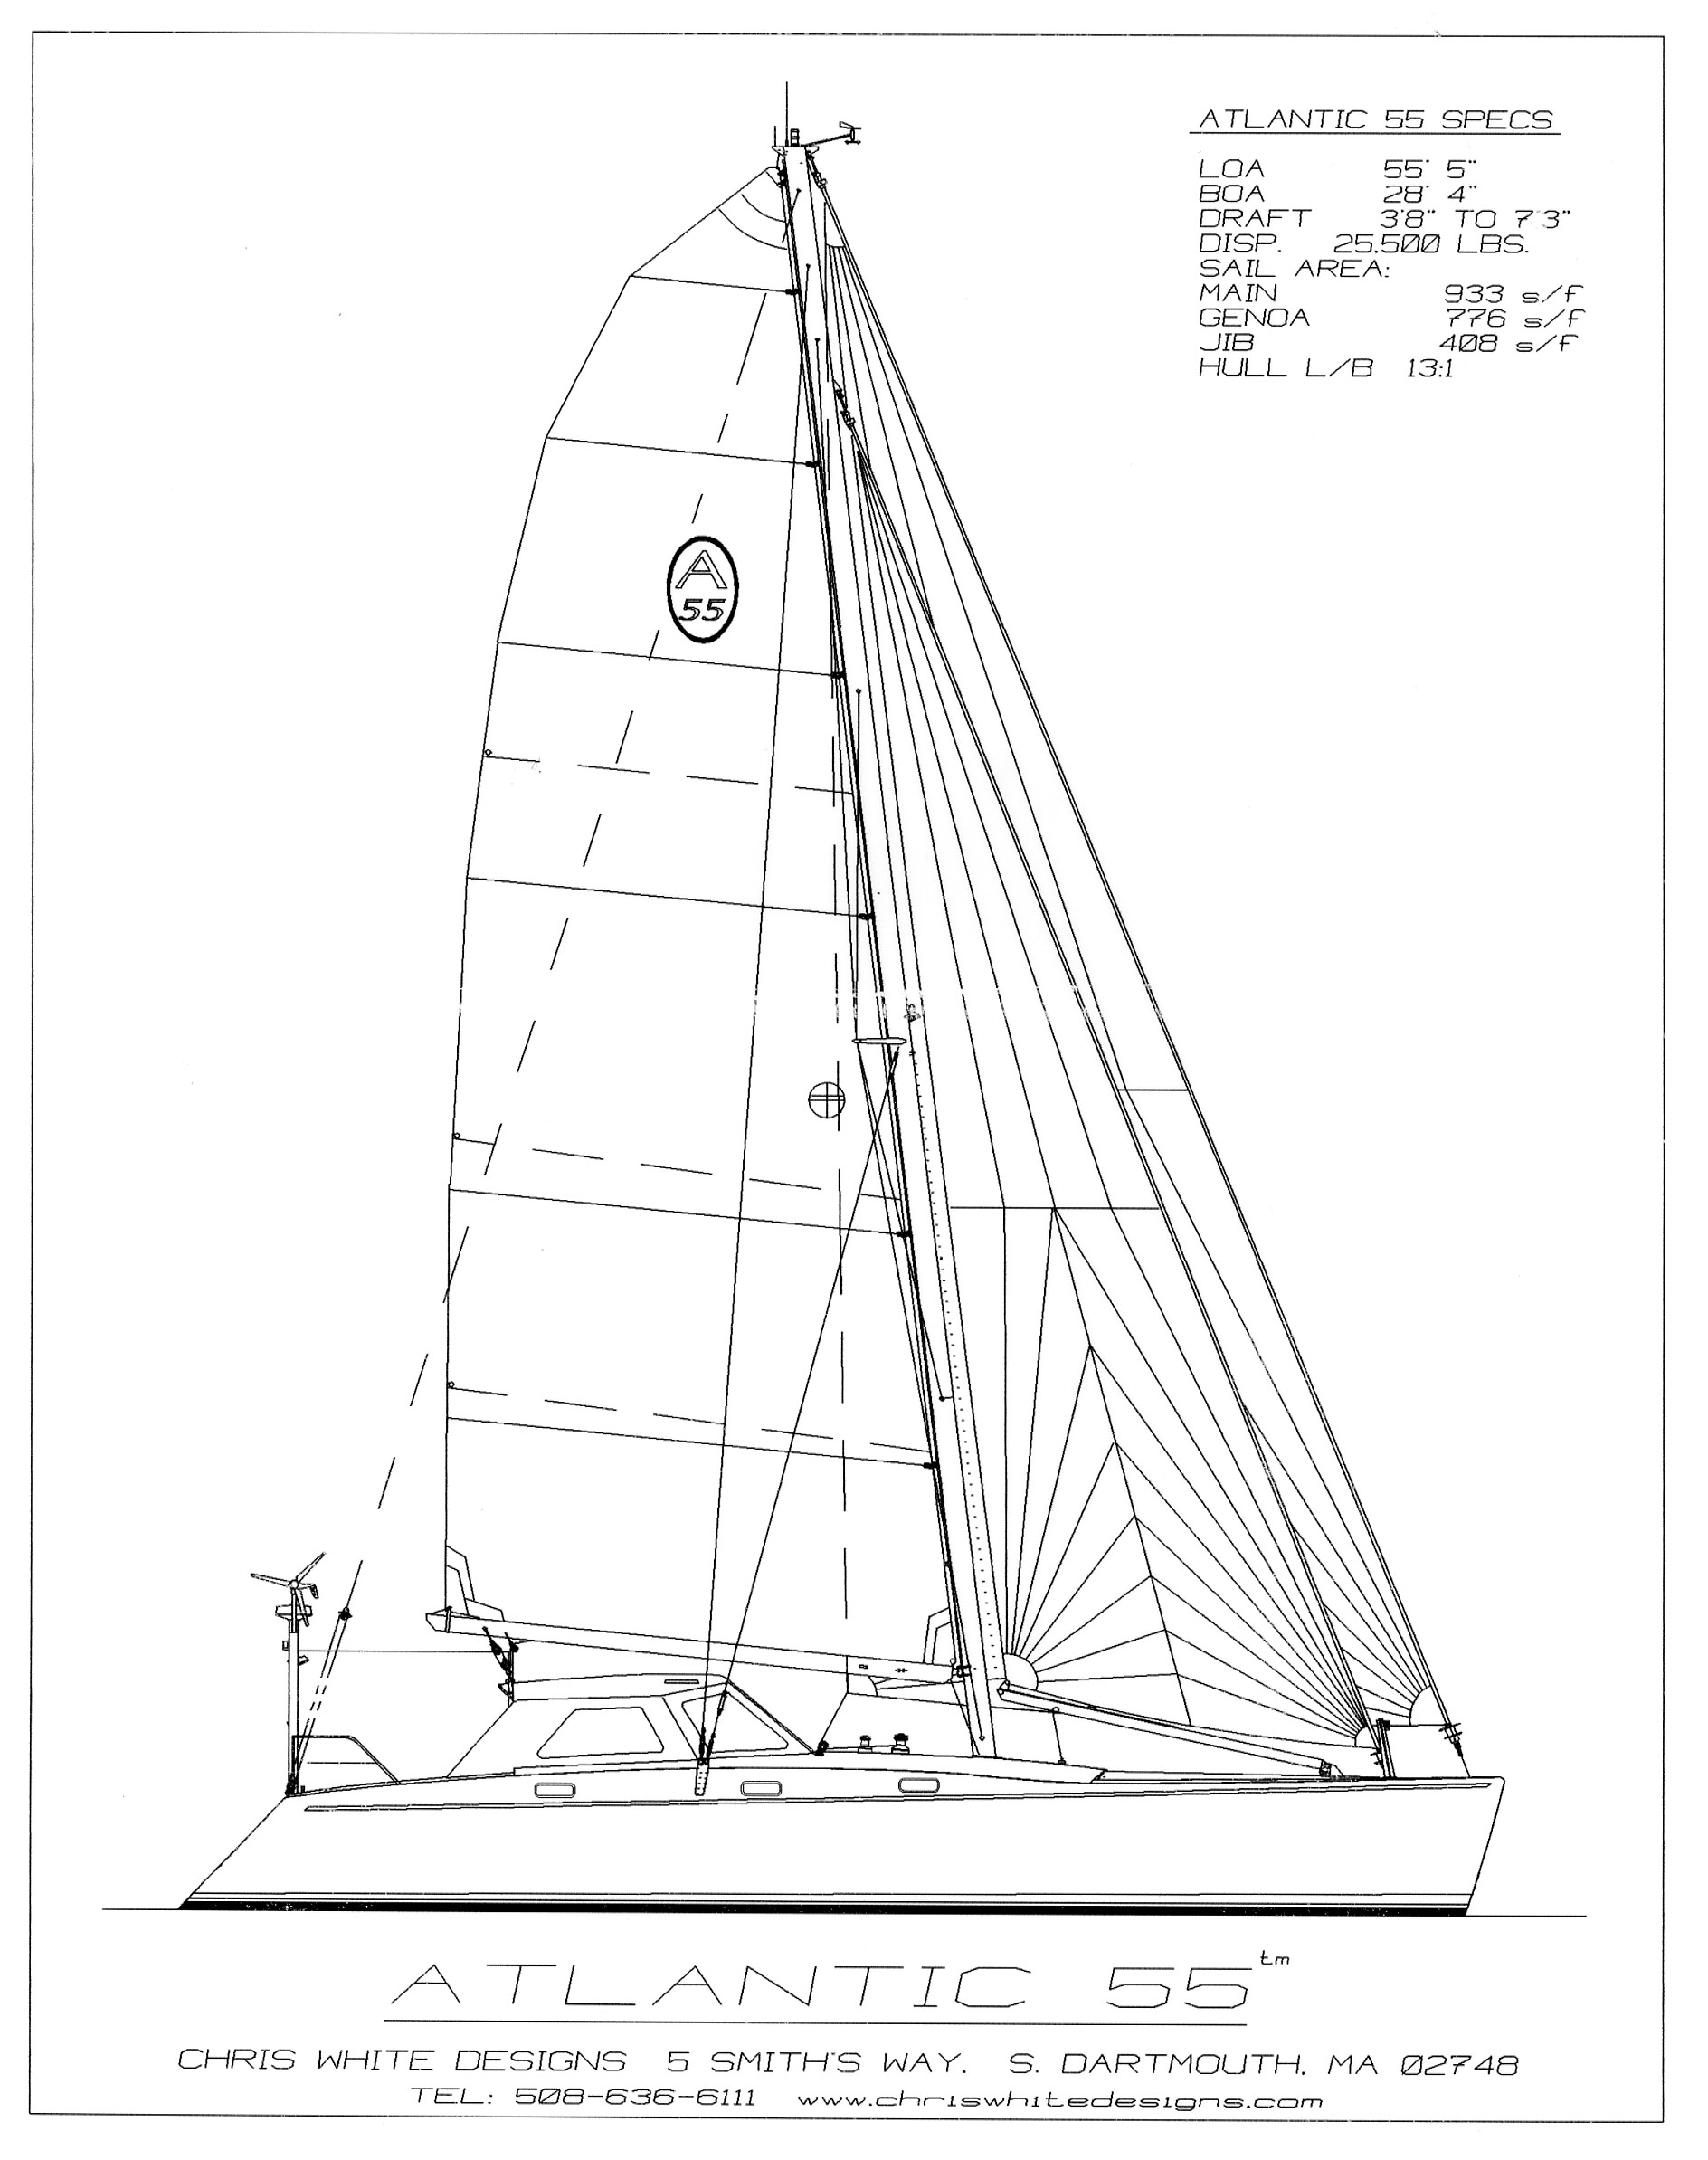 Marine wiring diagrams sailboat mast define project management